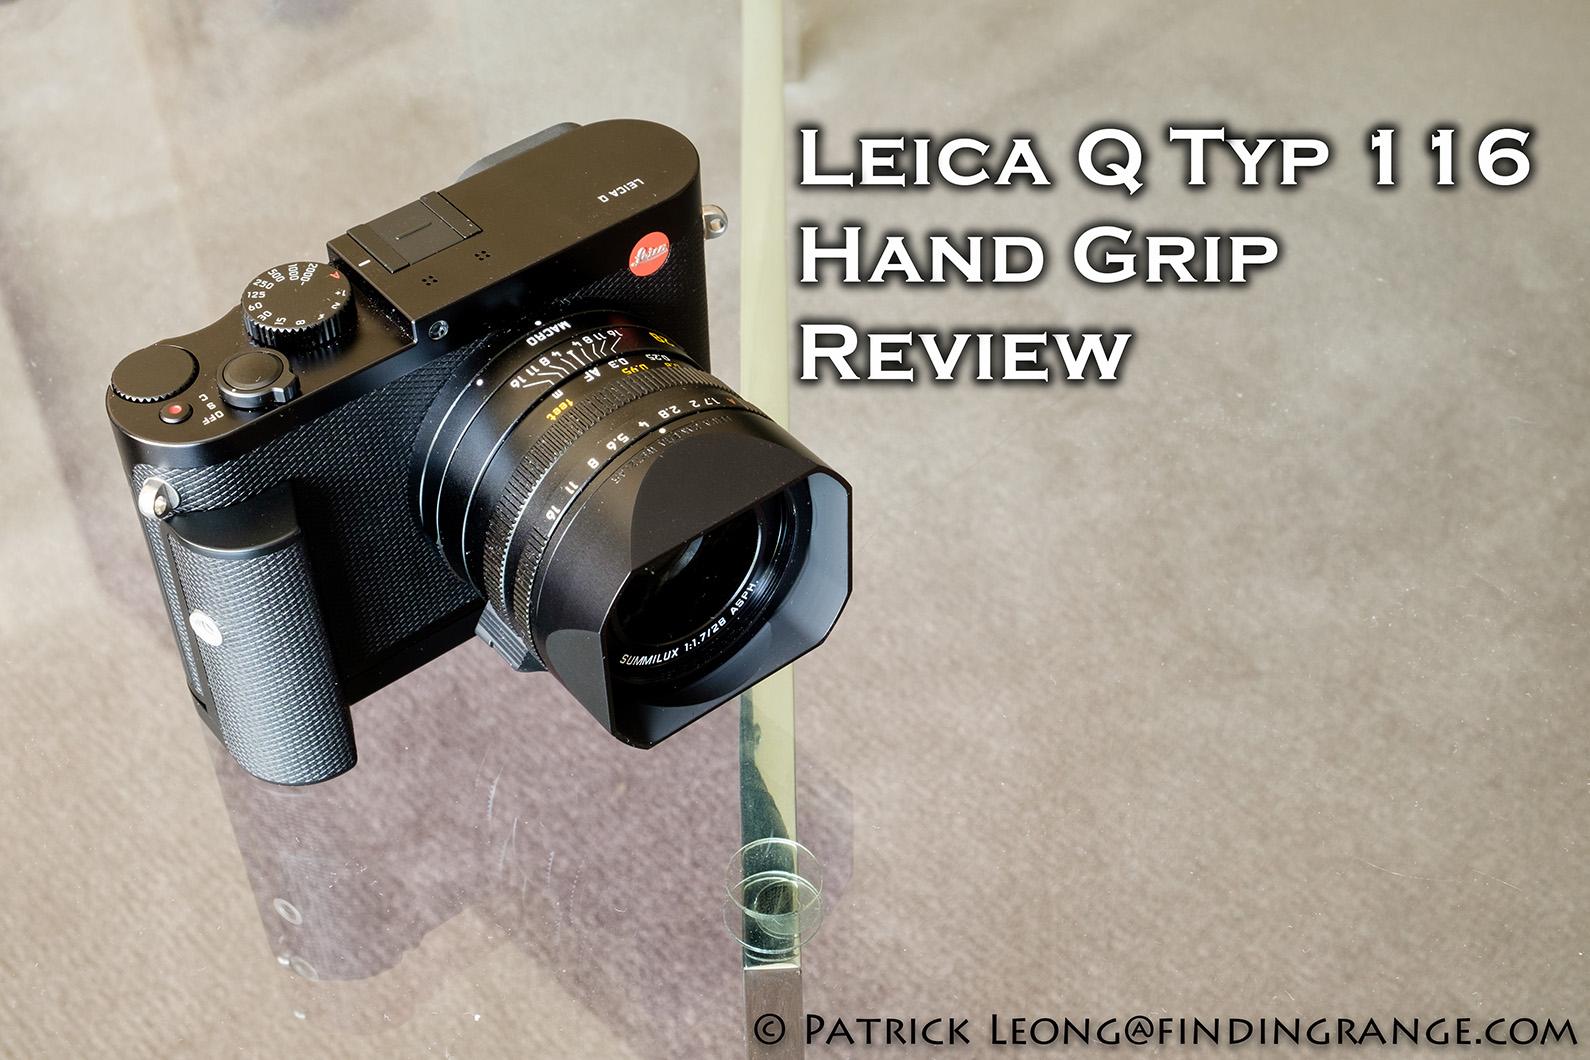 Leica-Q-Typ-116-Hand-Grip-Review-5